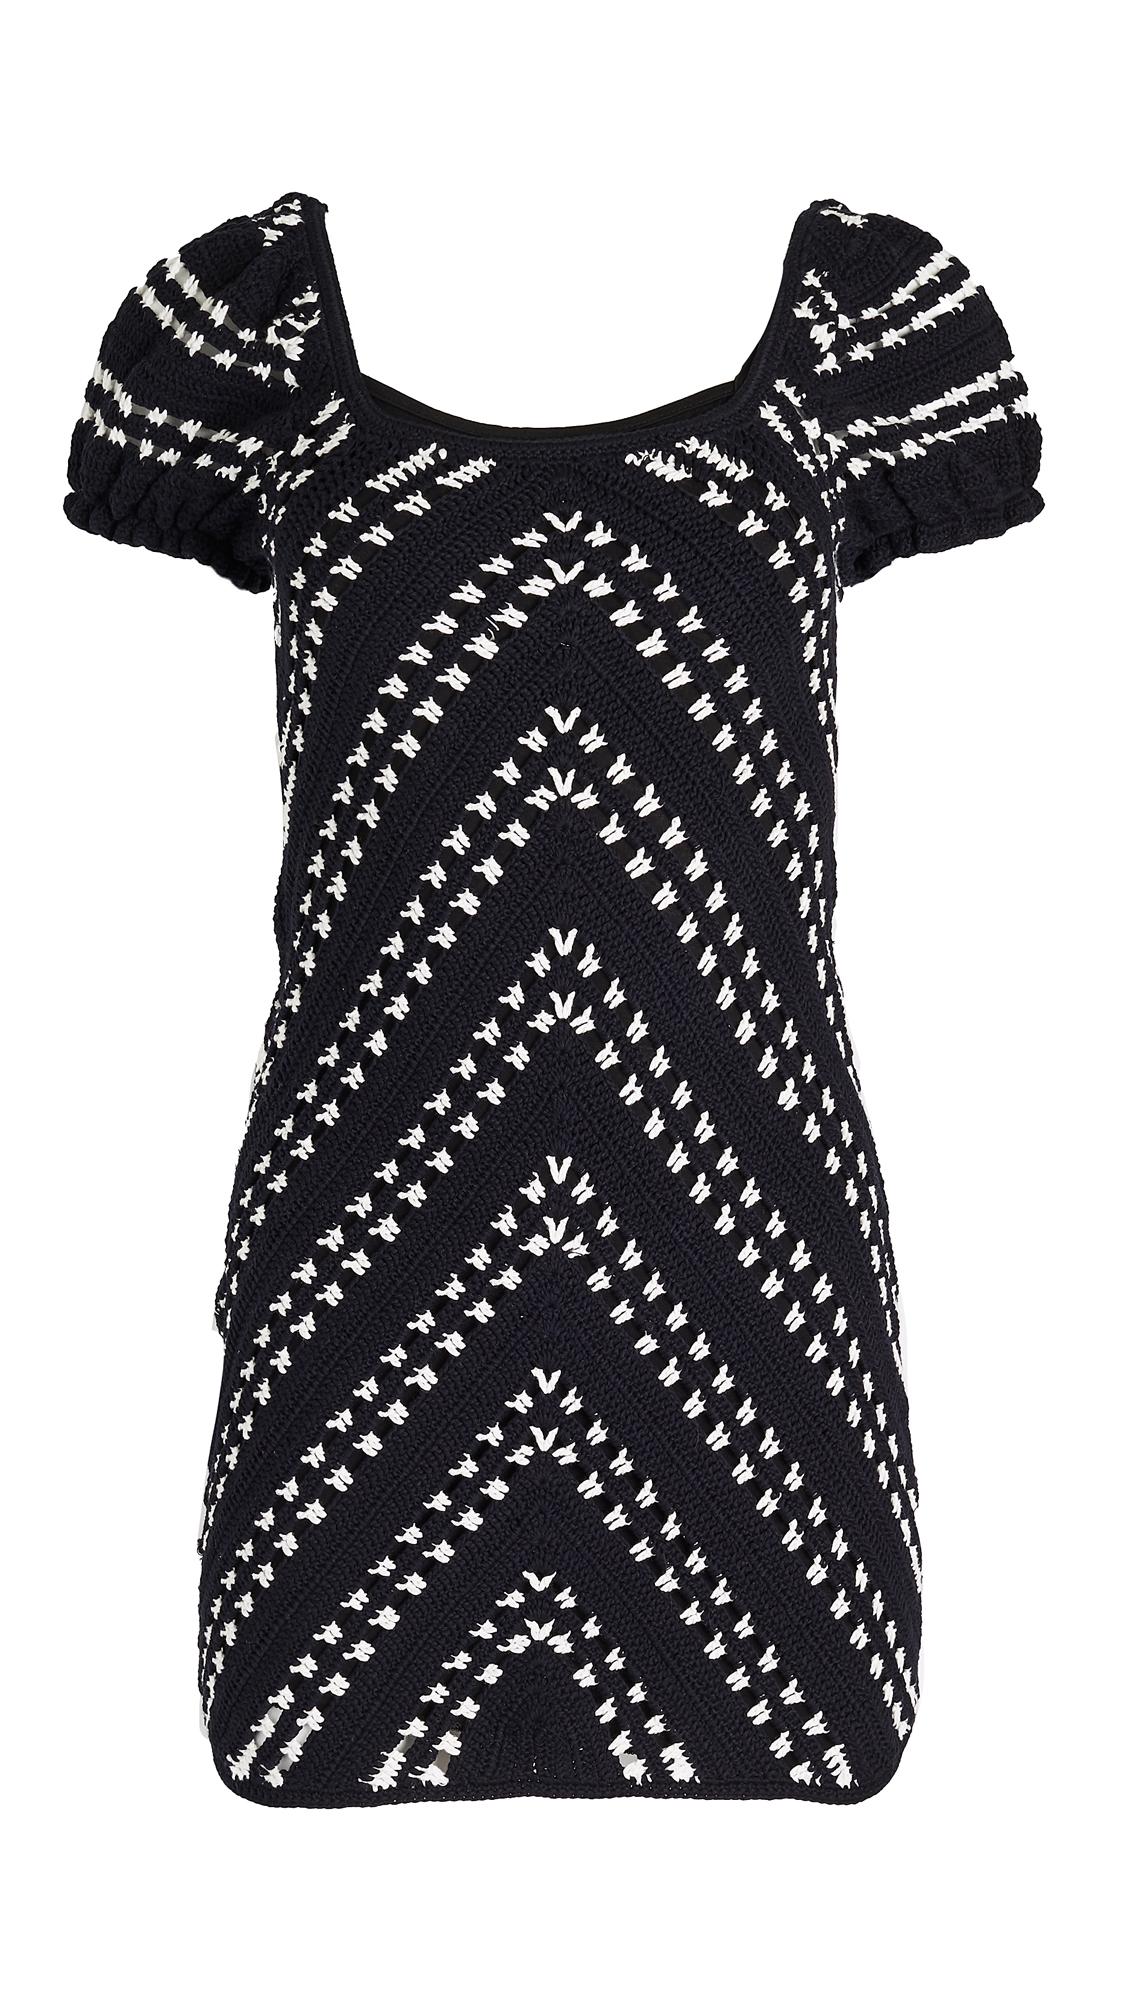 Suboo Harlow Crochet Mini Dress